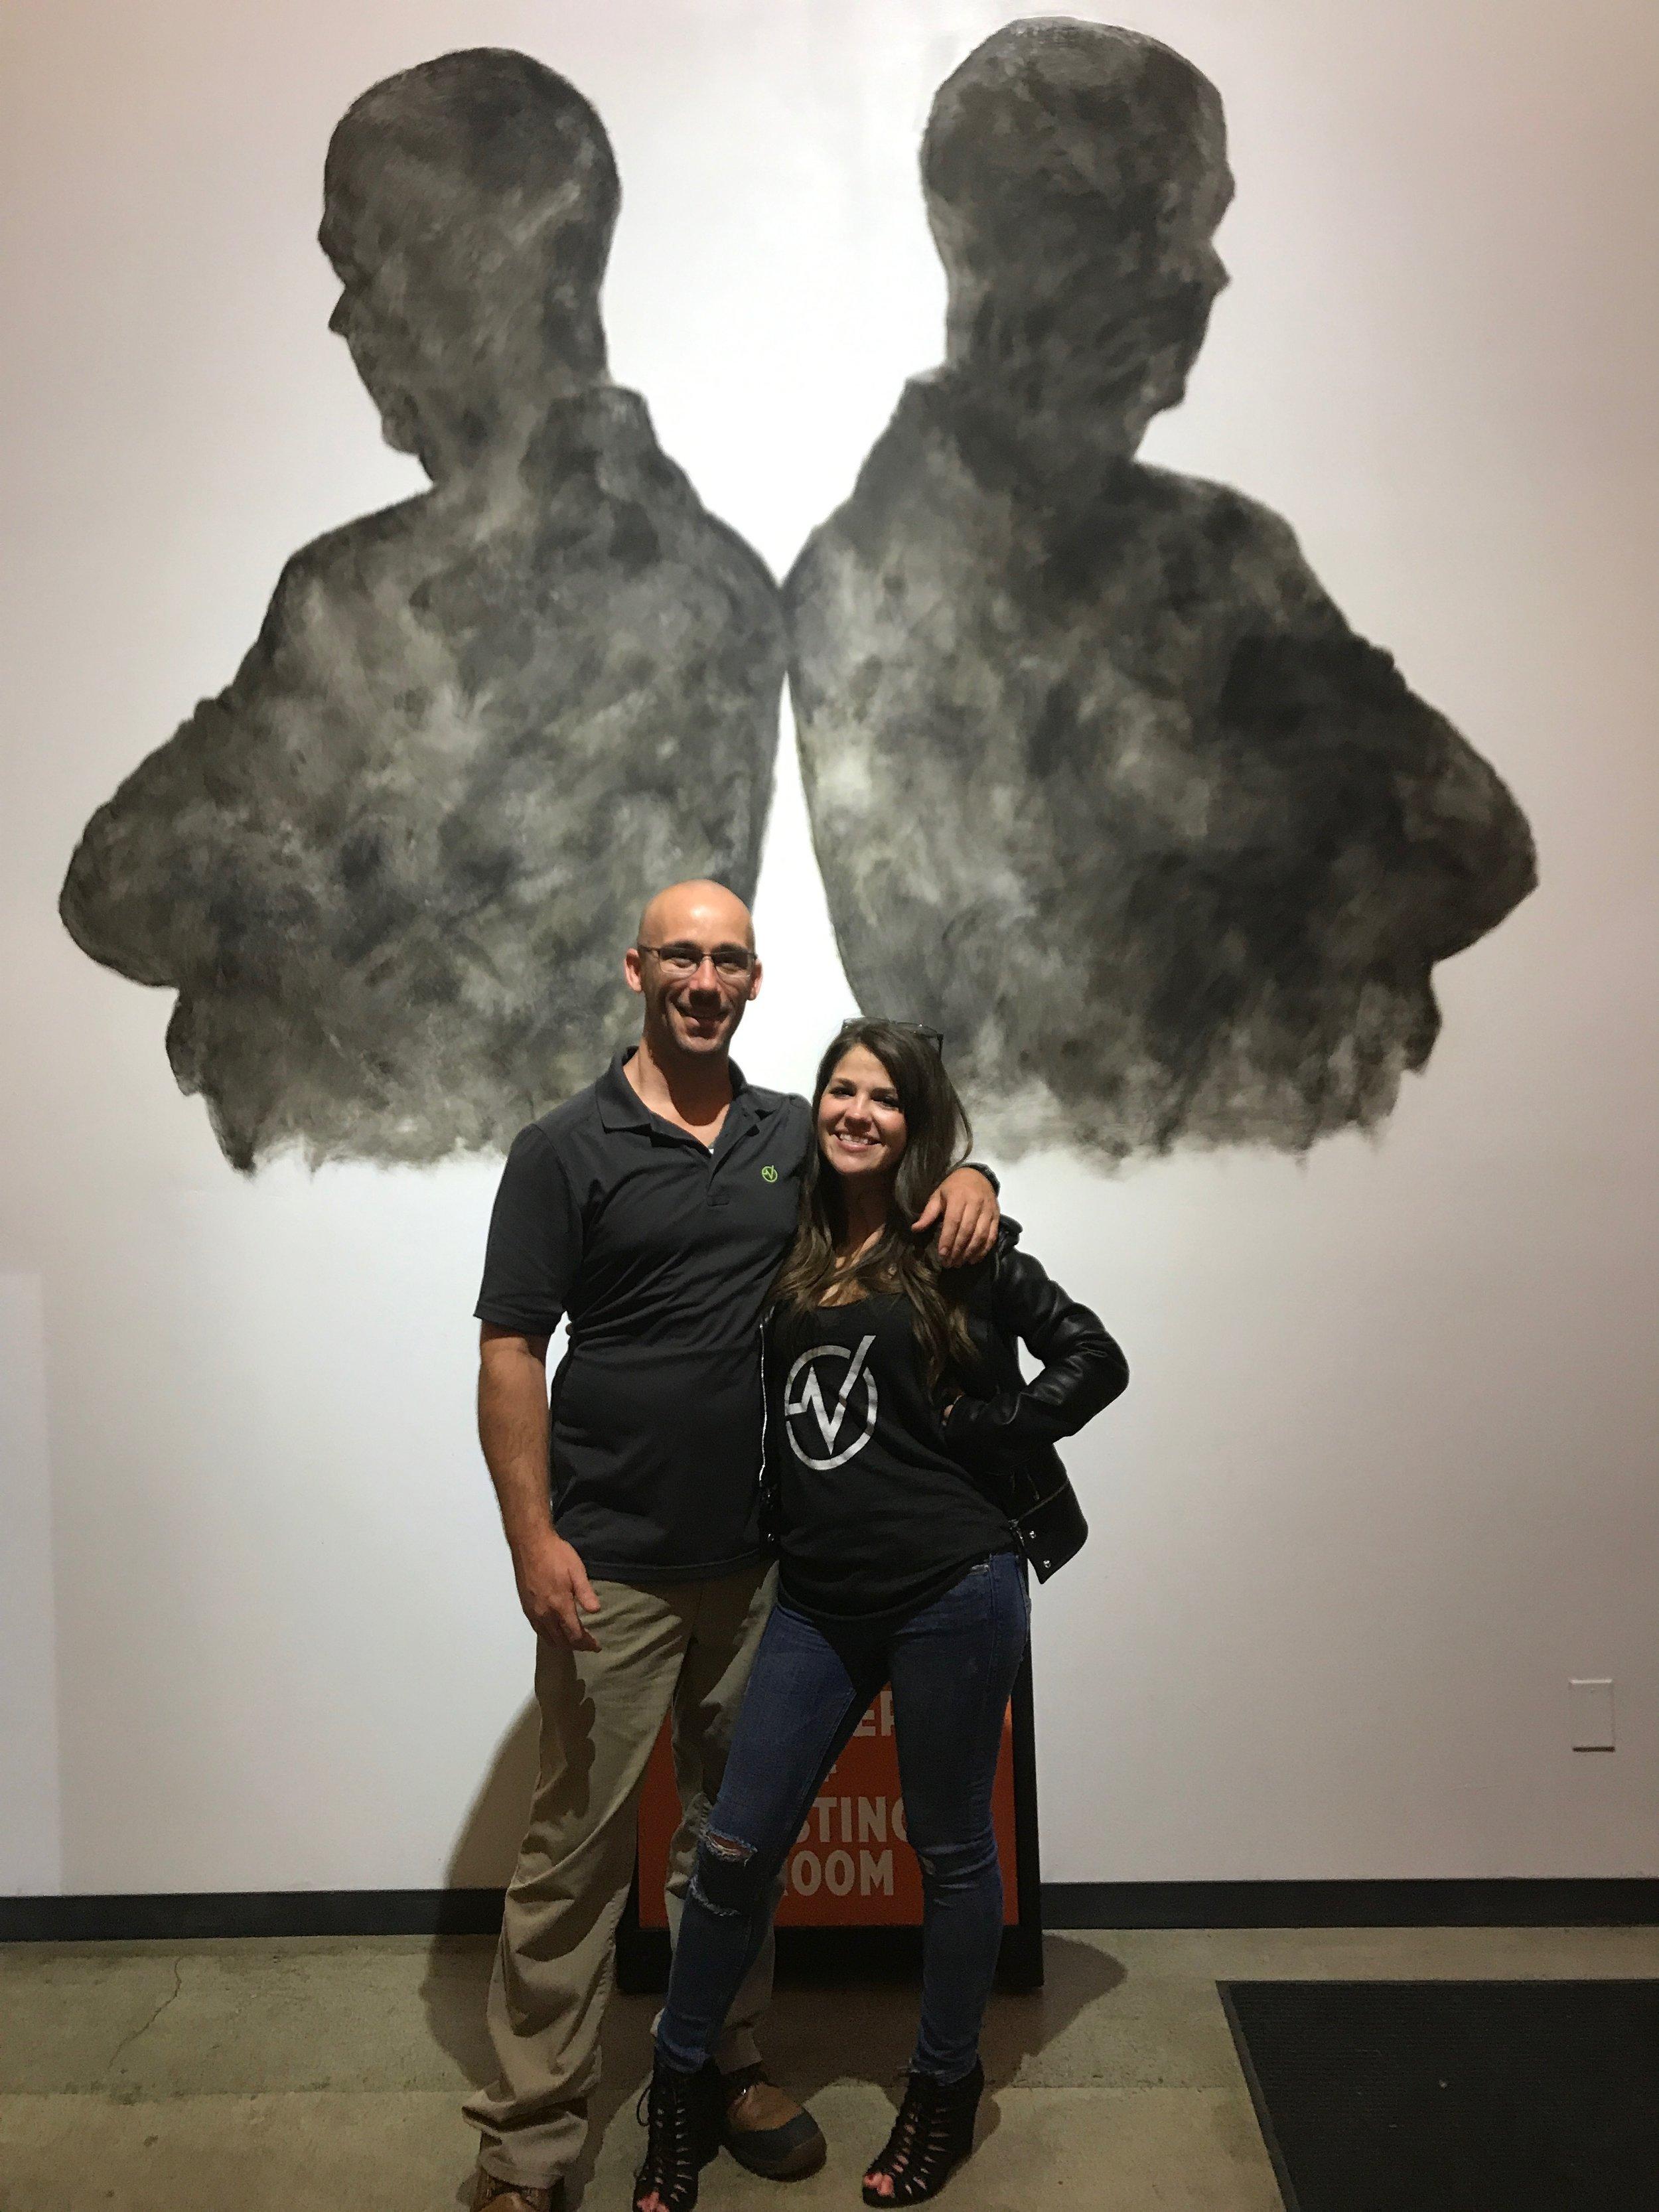 Graham Burkey and Brittney Hogan of Virago Fitness